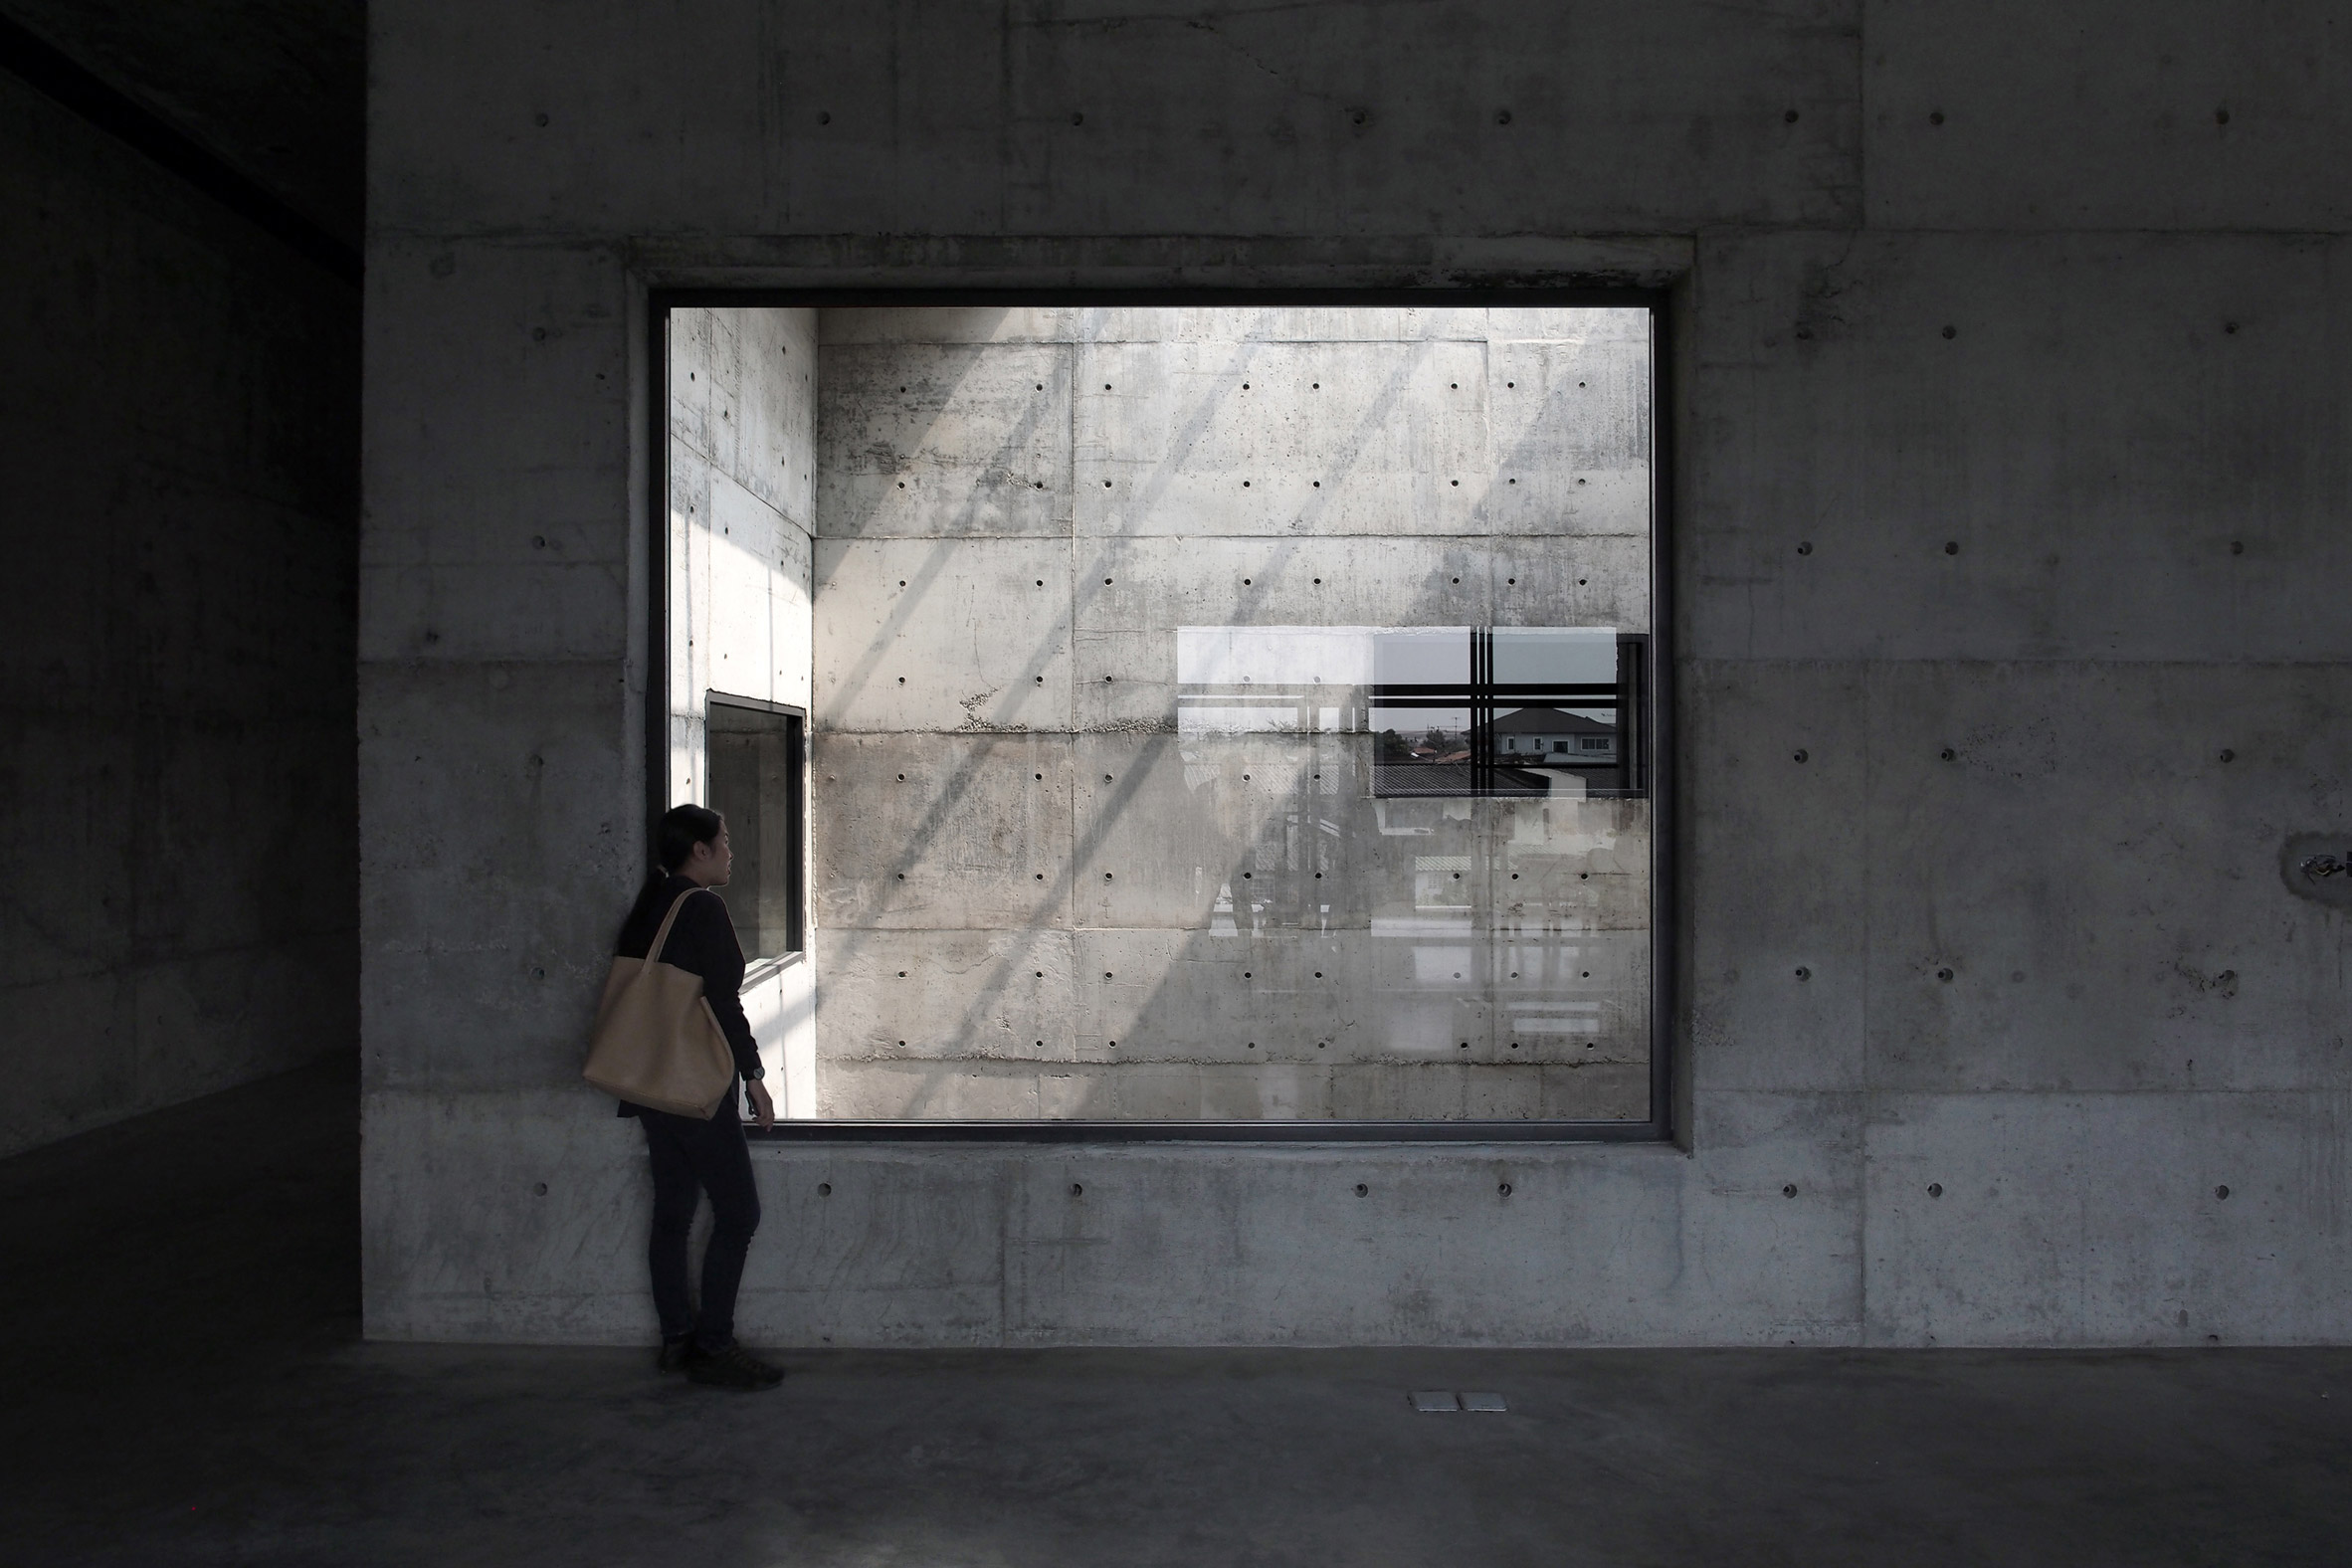 solid-concrete-gallery-as-living-artwork-aswa-architecture-bangkok-thailand_dezeen_2364_col_3.jpg